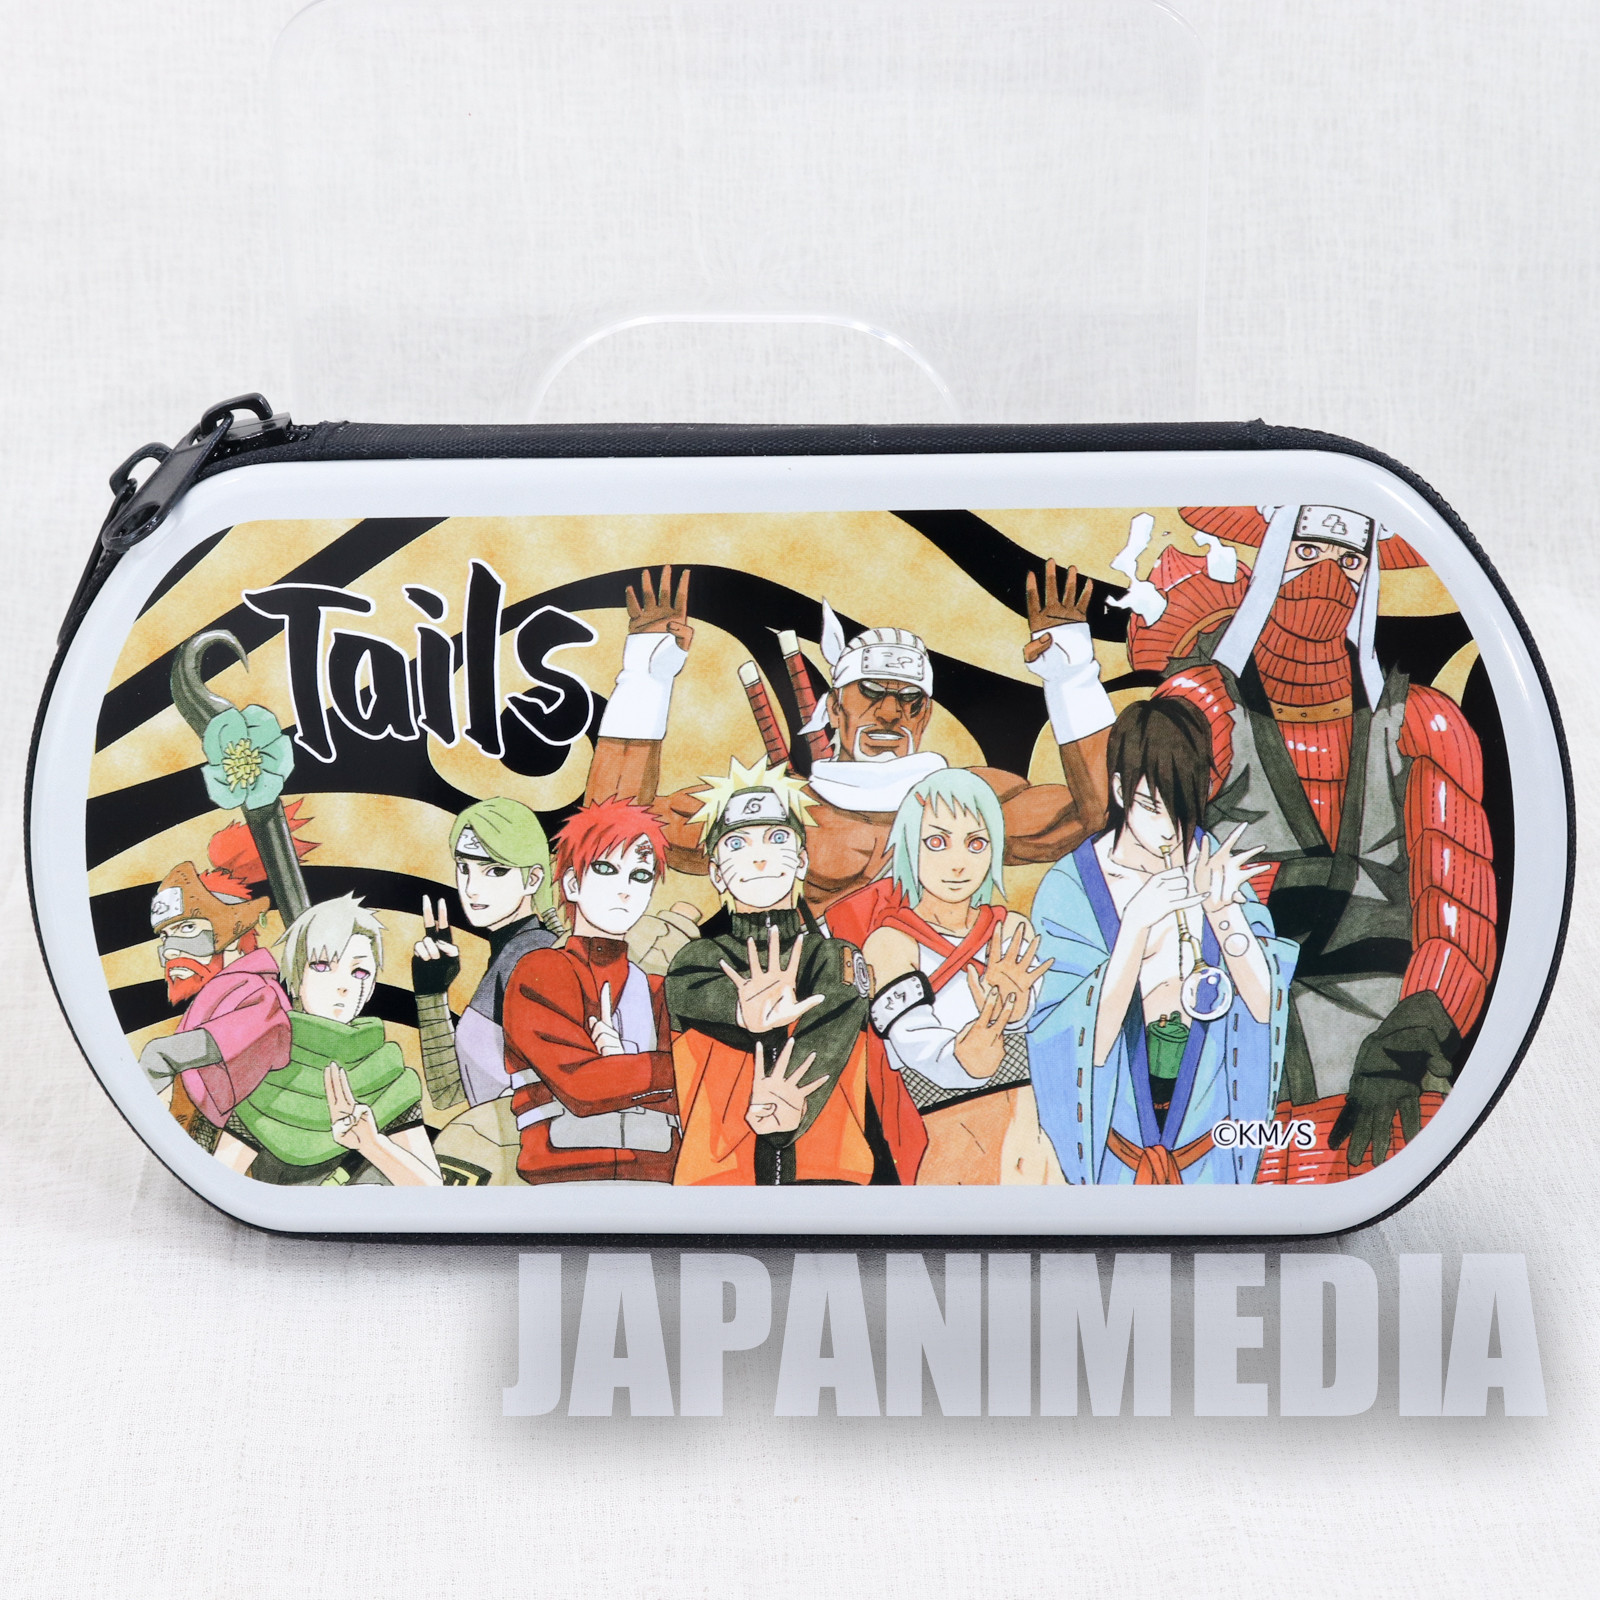 NARUTO Shippuden Can Case Jump Festa 2009 JAPAN ANIME